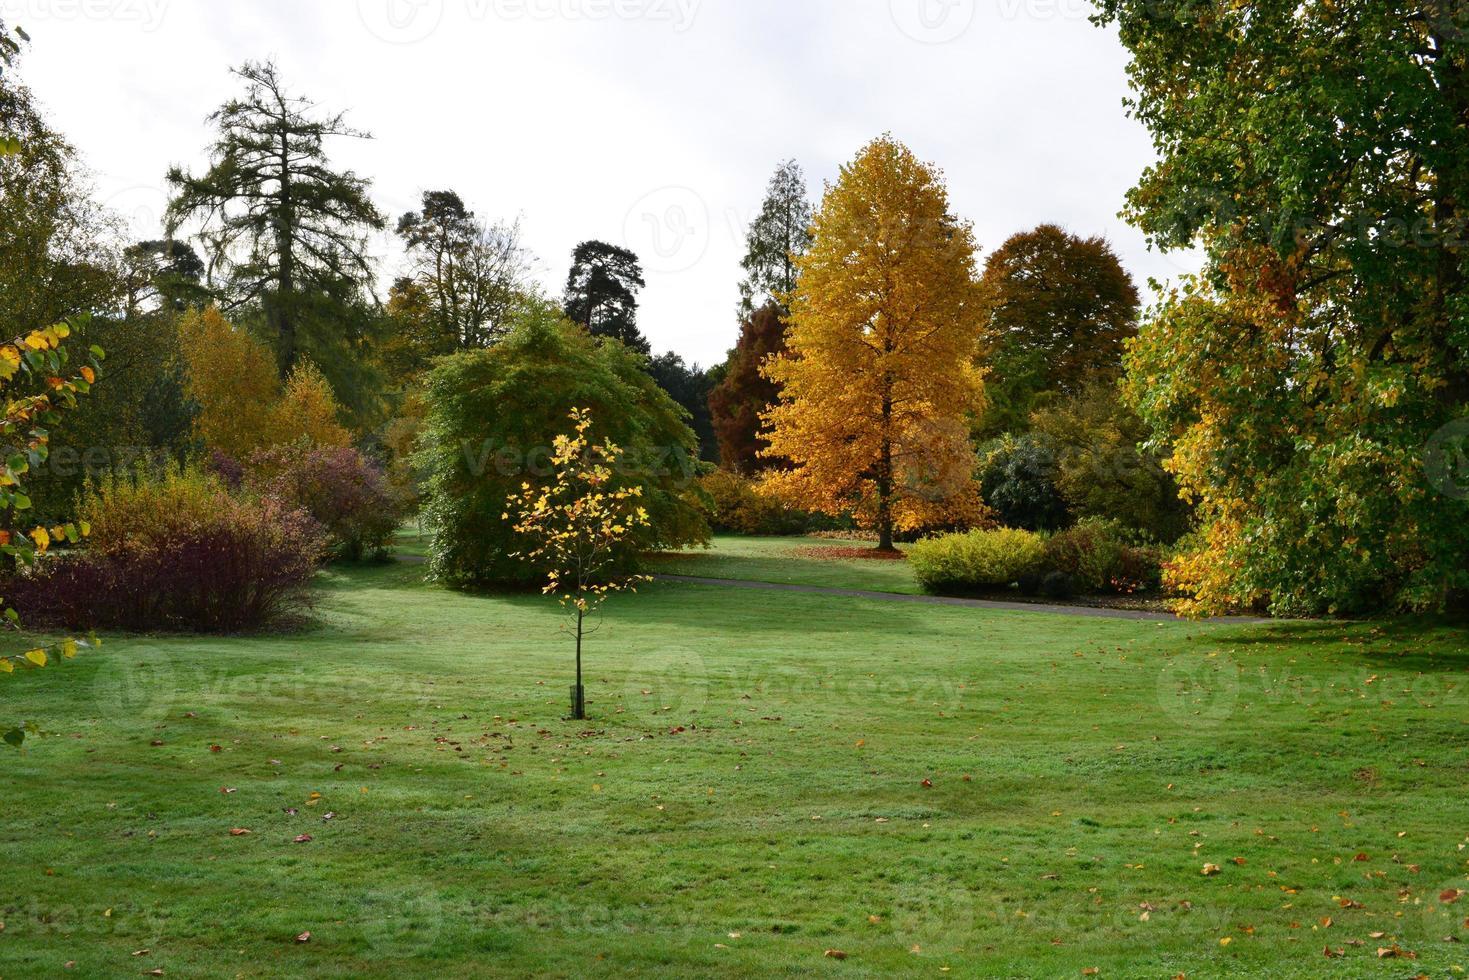 autunno inglese foto